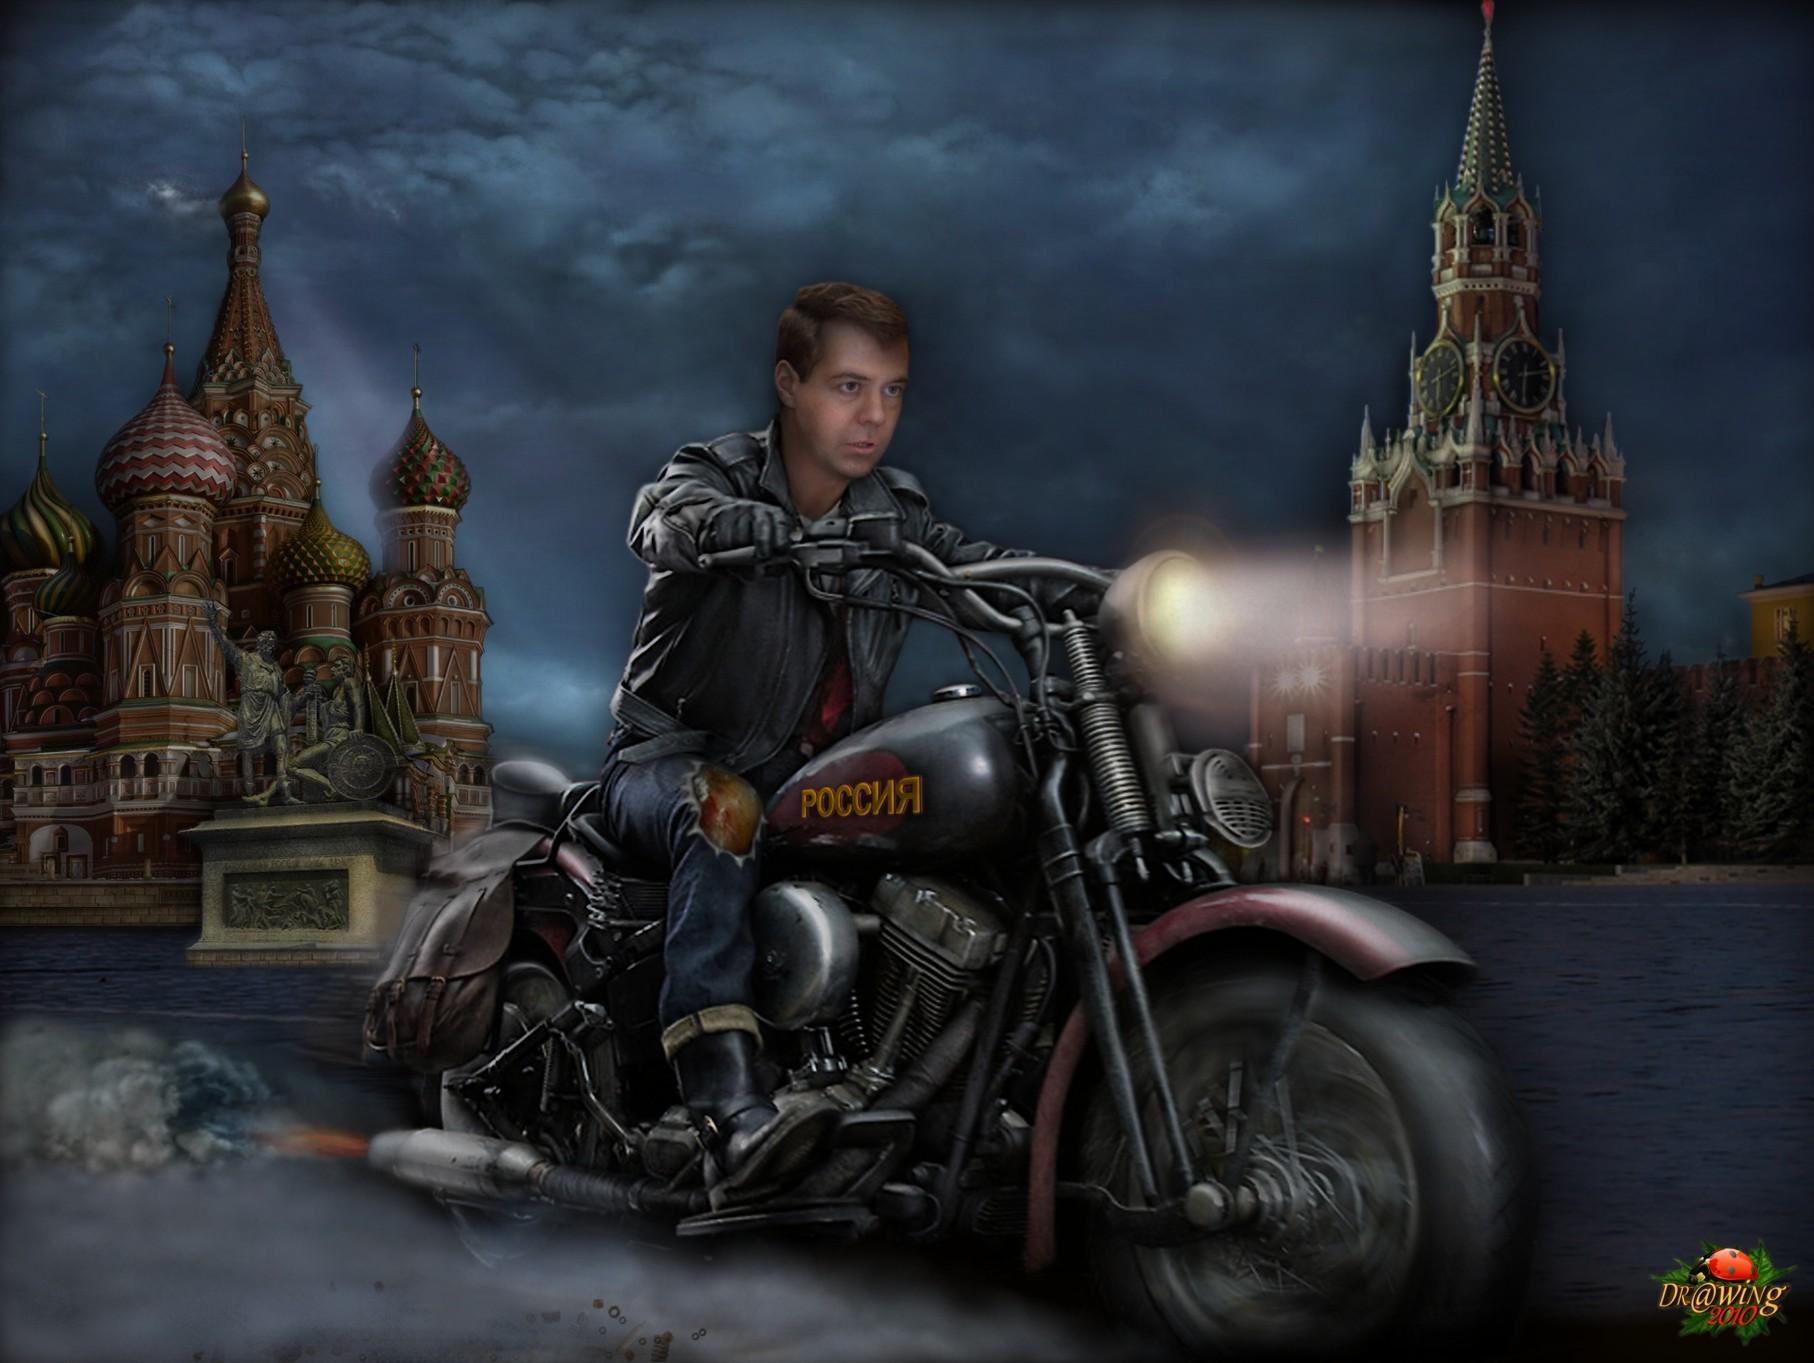 367375_medvedev_motocikl_kreml._1814x1363_(www.GdeFon.ru)